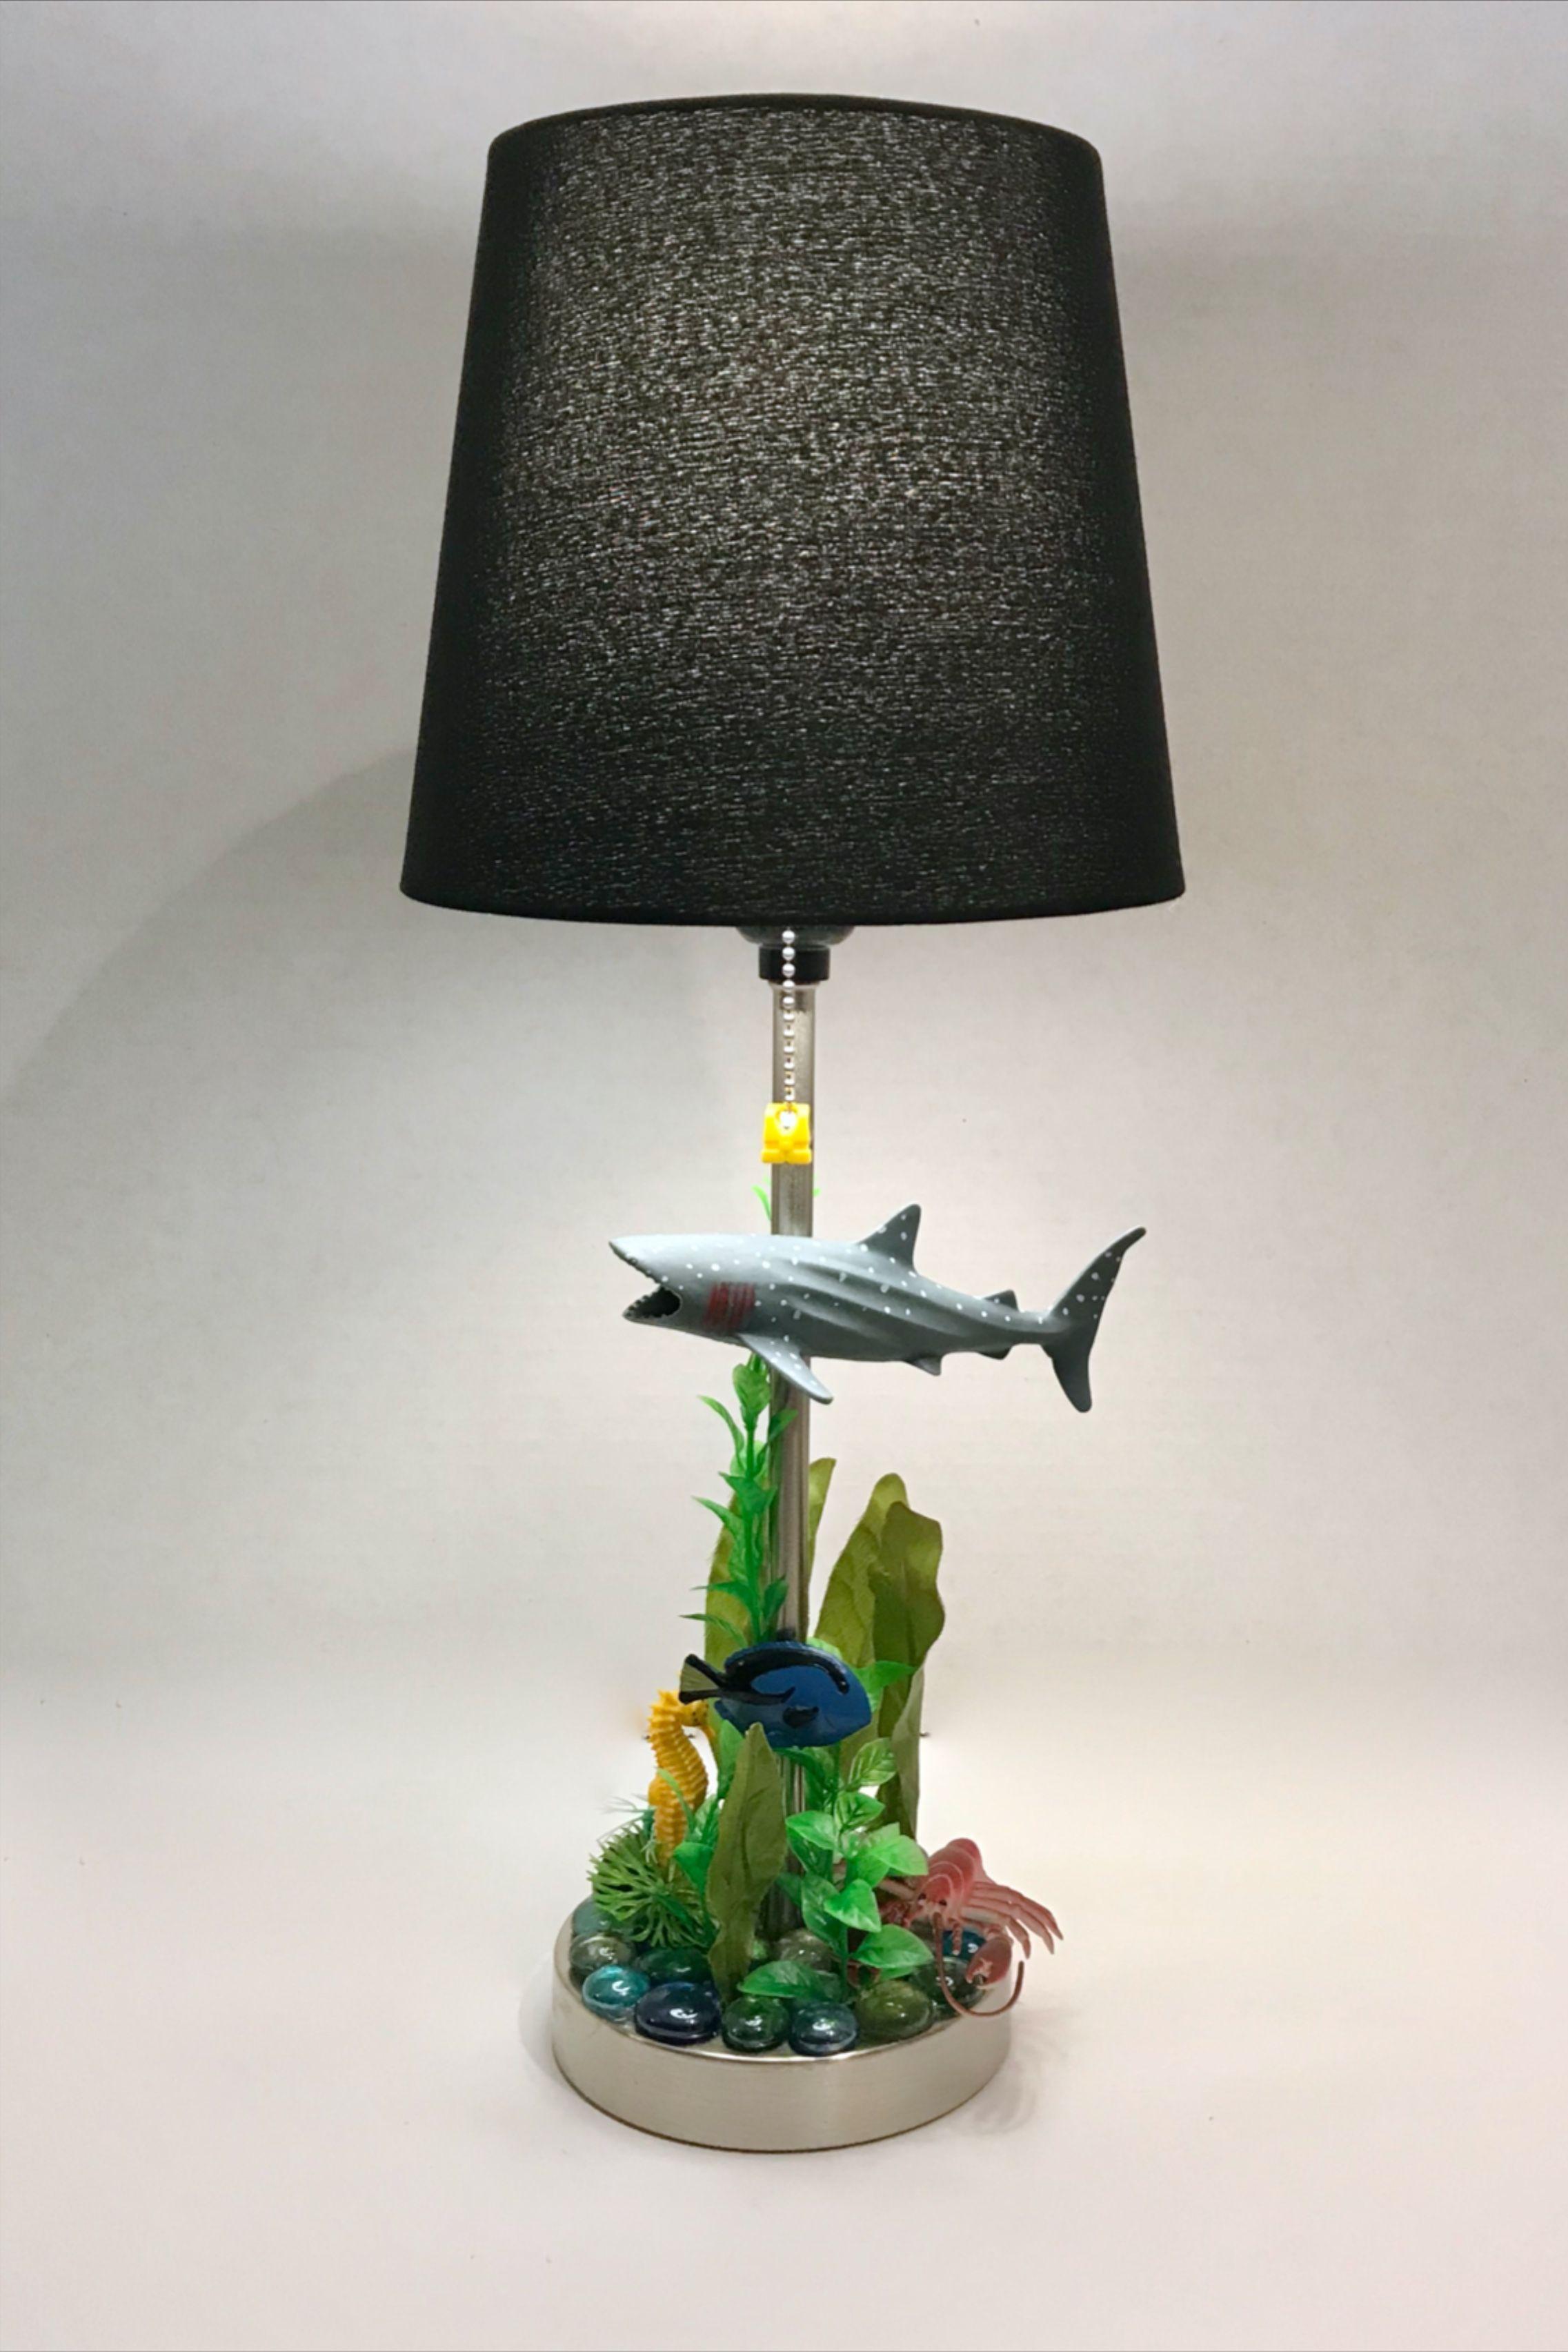 Shark lamp nightstand children/'s room decor ocean beach sea themed made to order